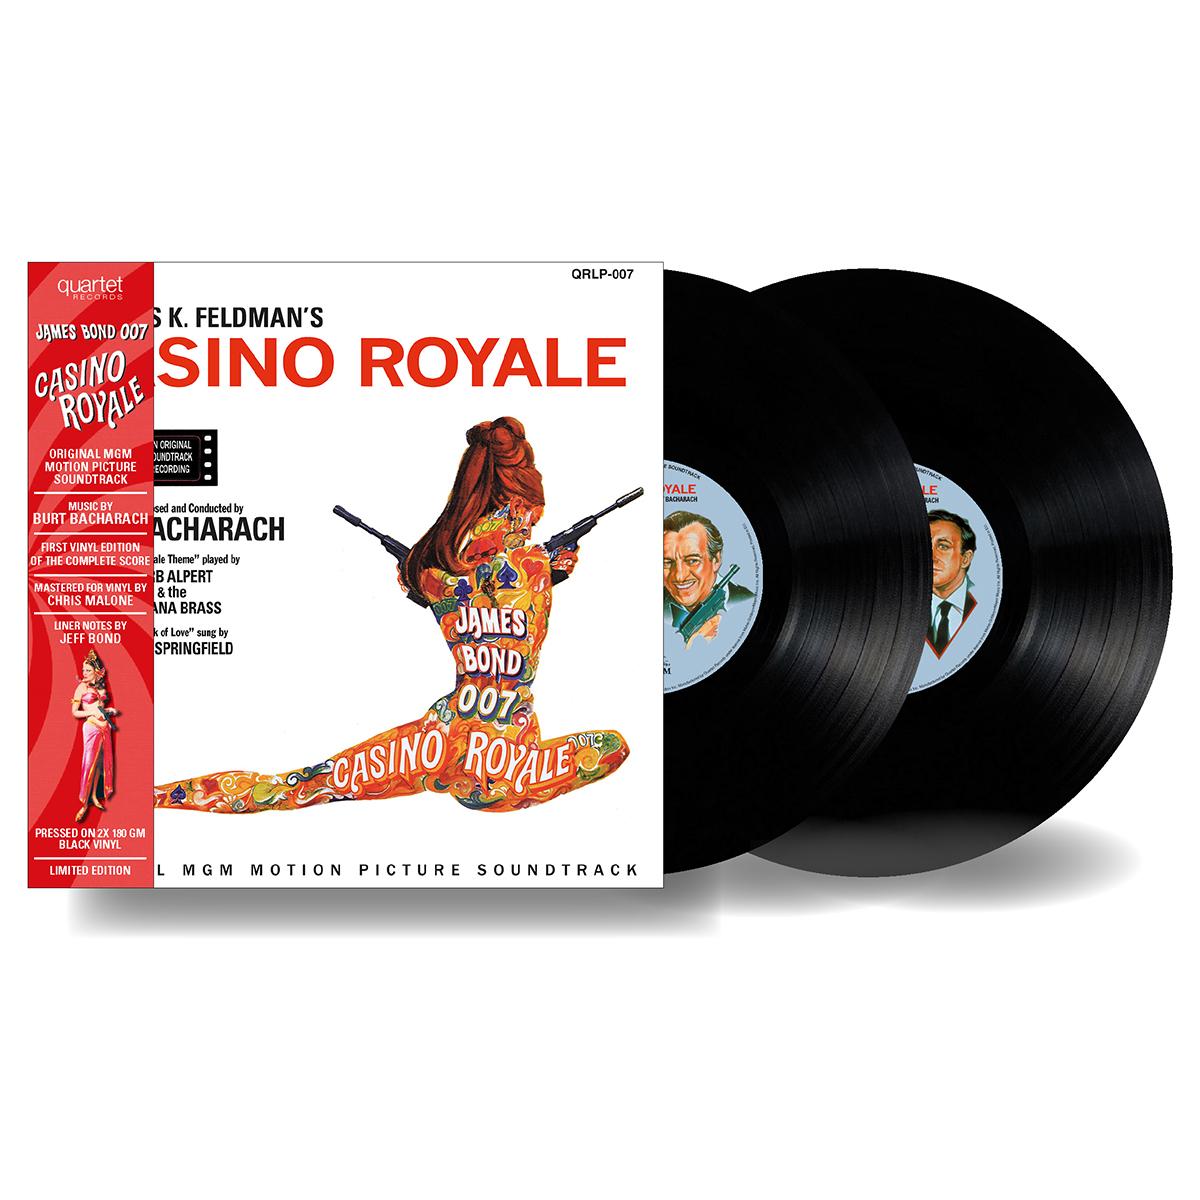 Quartet records casino royale diablo 2 in game cheats